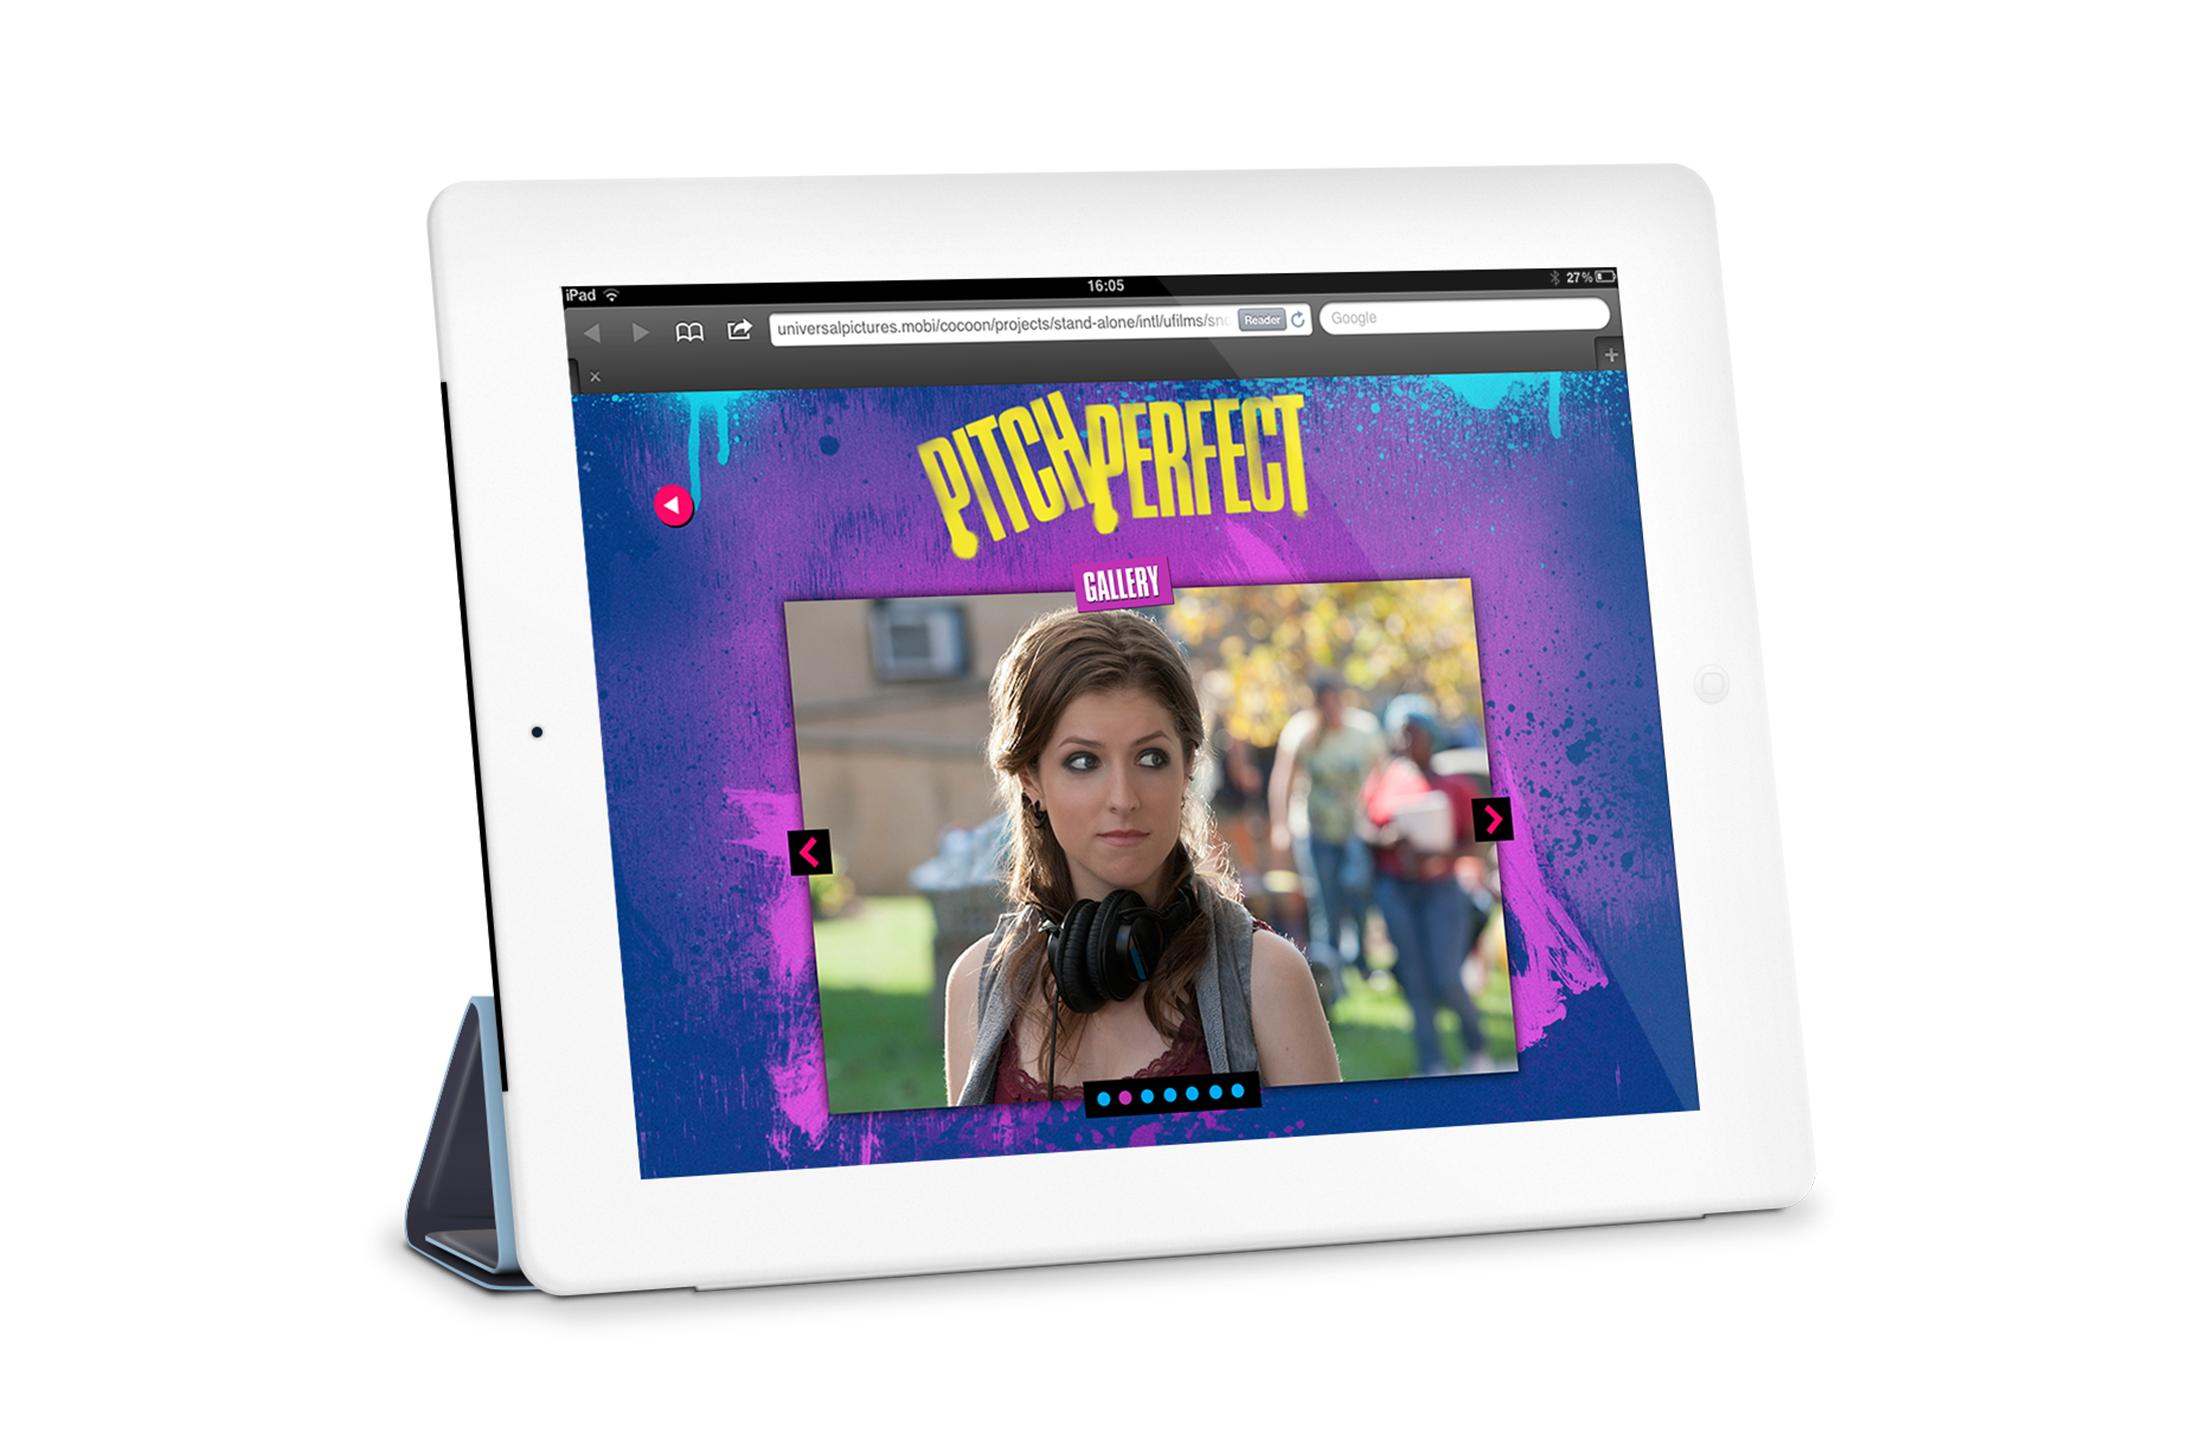 iPad: Photo gallery screen.